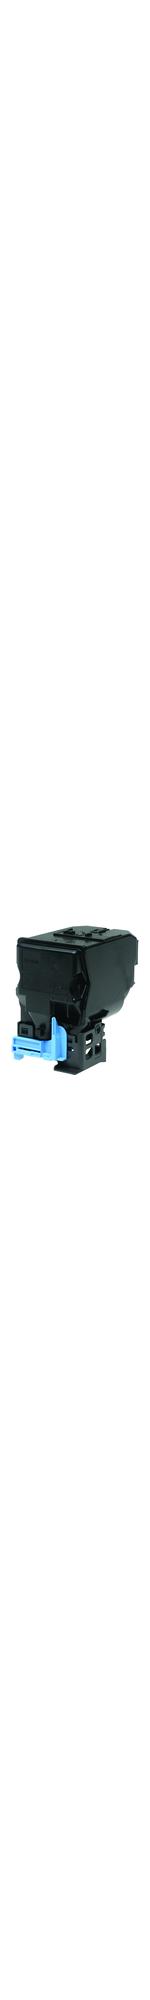 Epson C13S050593 Toner Cartridge - Black